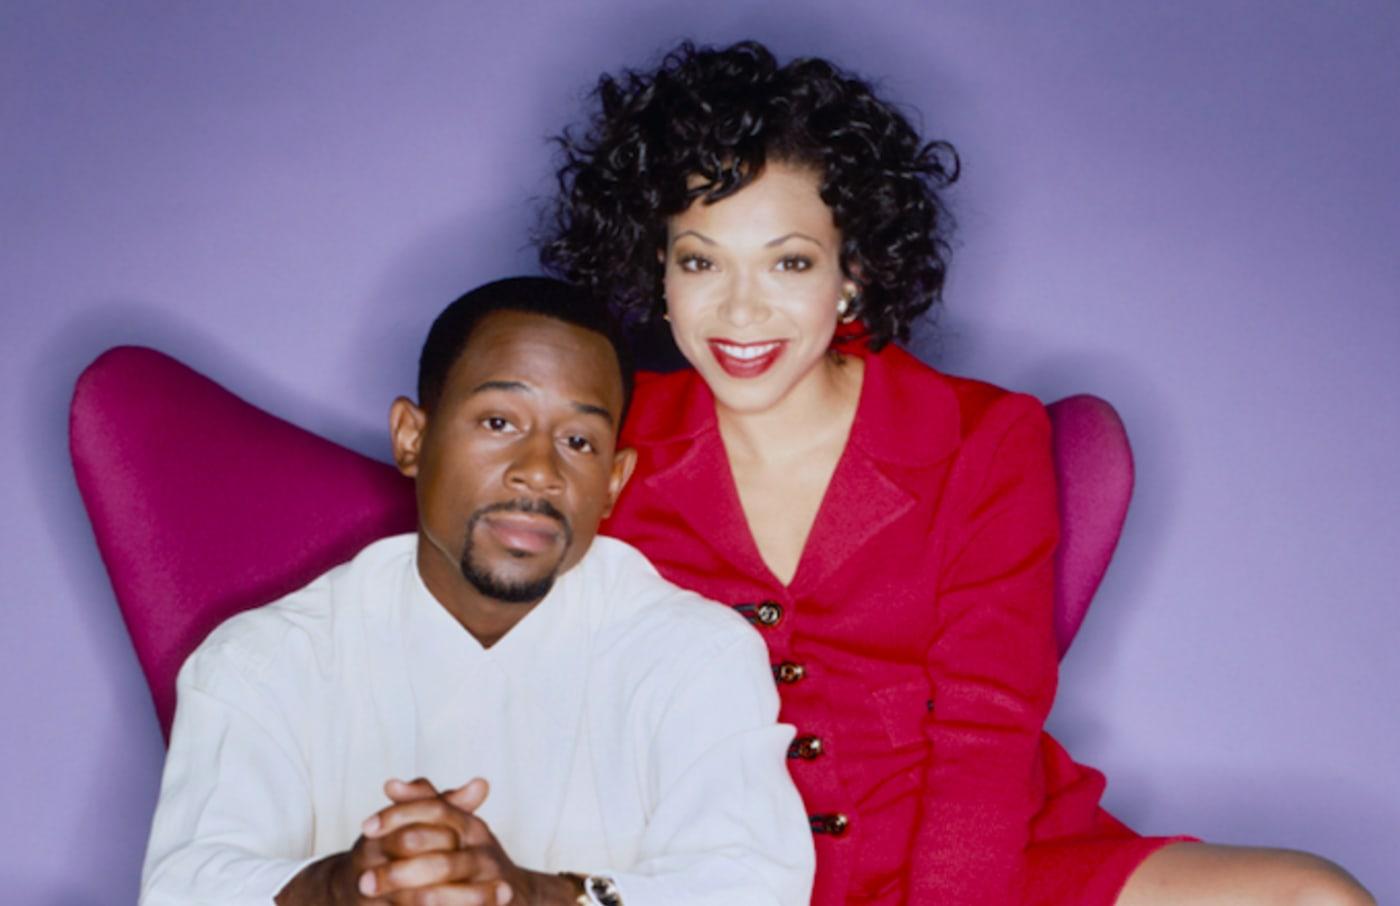 Martin Lawrence and Tisha Campbell